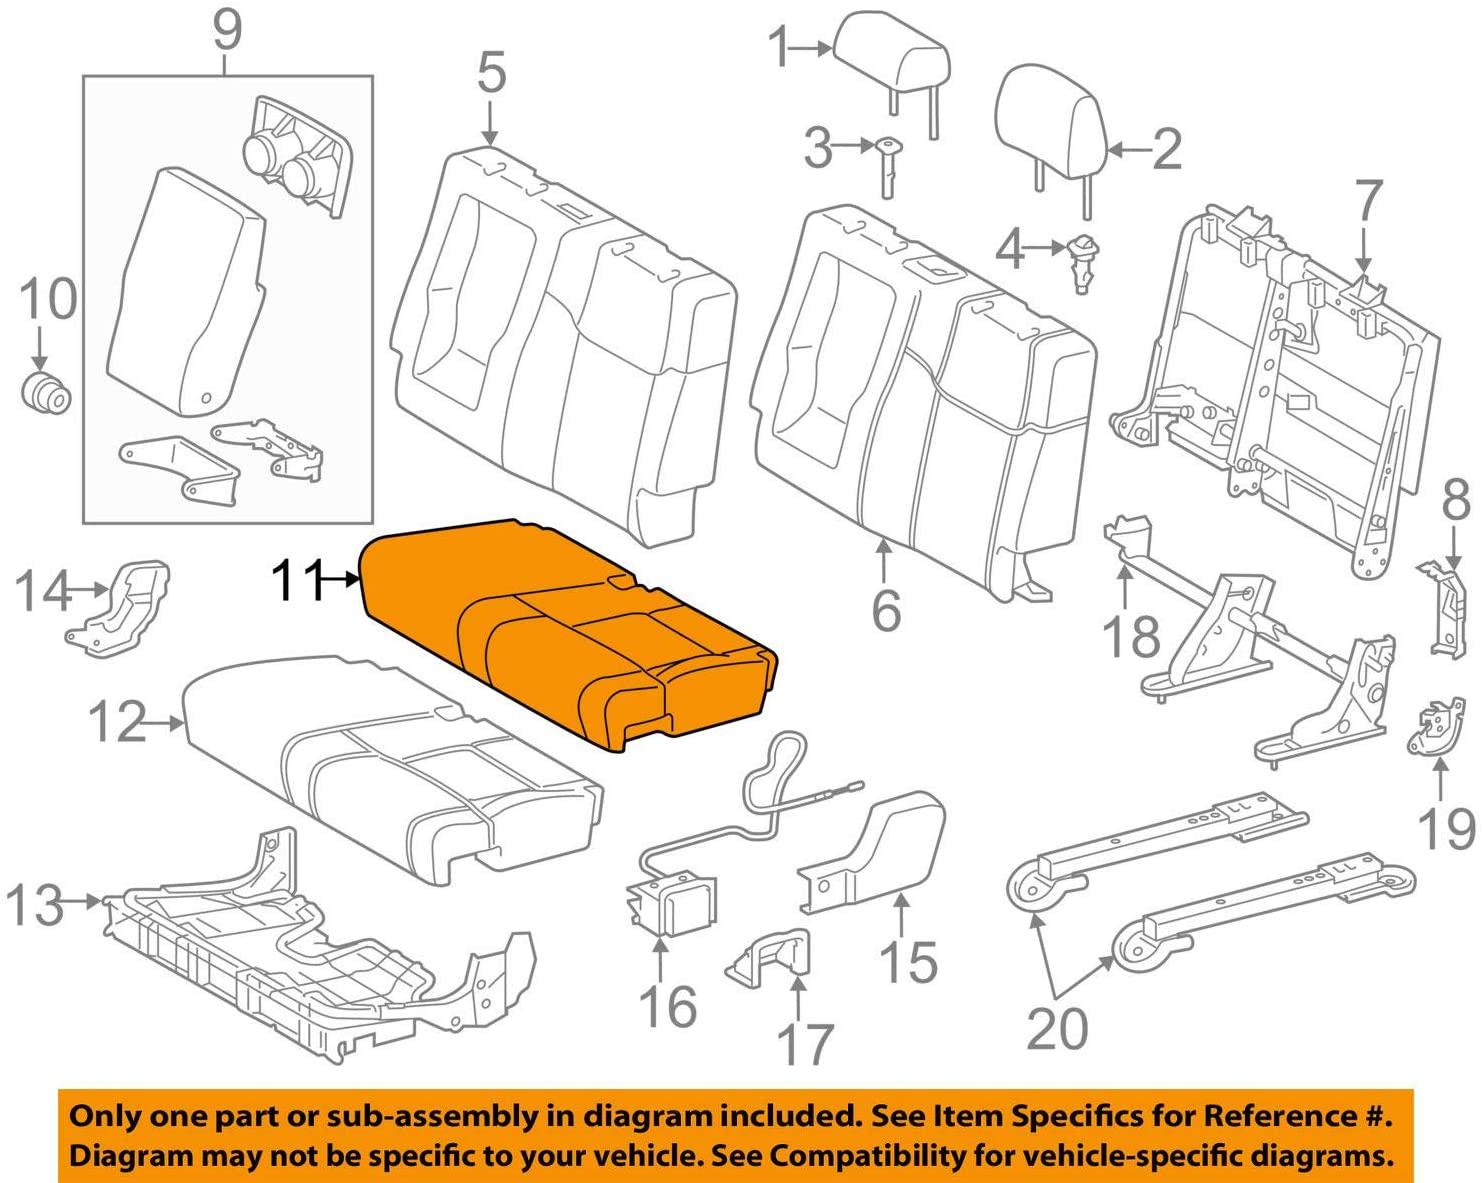 TOYOTA Genuine 71076-0C440-E1 Seat Cushion Cover